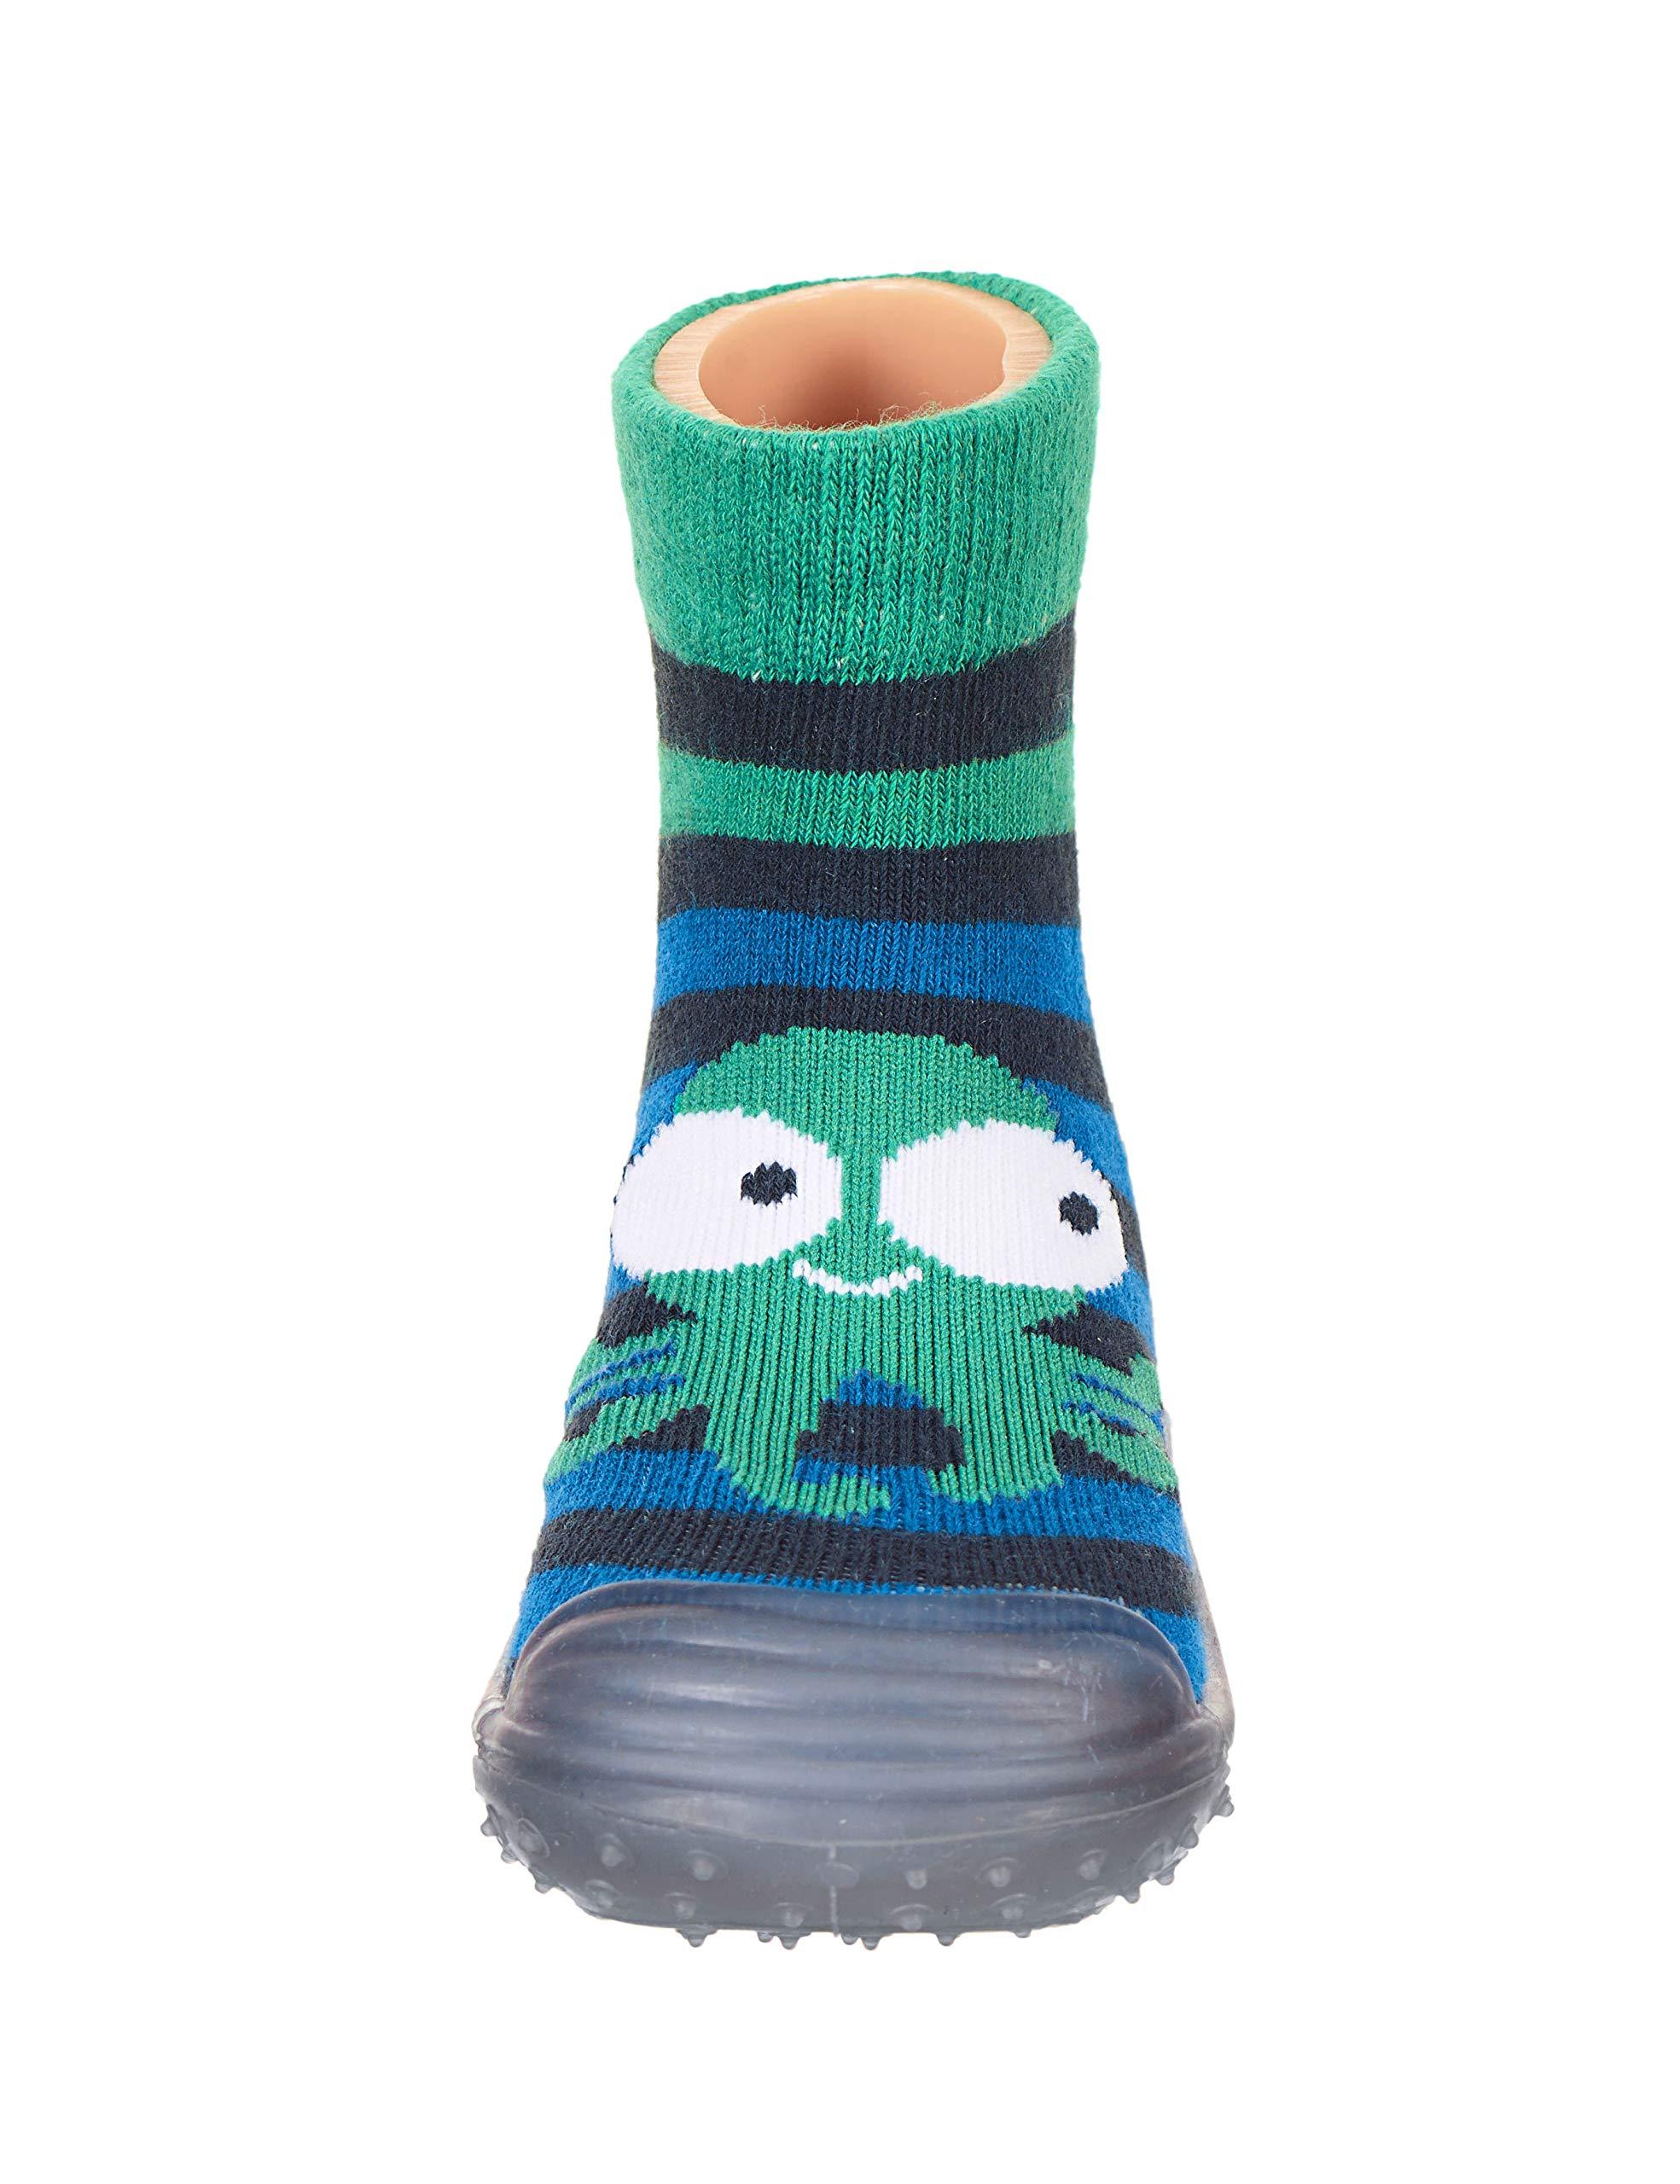 Sterntaler Adventure-Socks Qualle, Zapatillas Impermeables para Niños 4